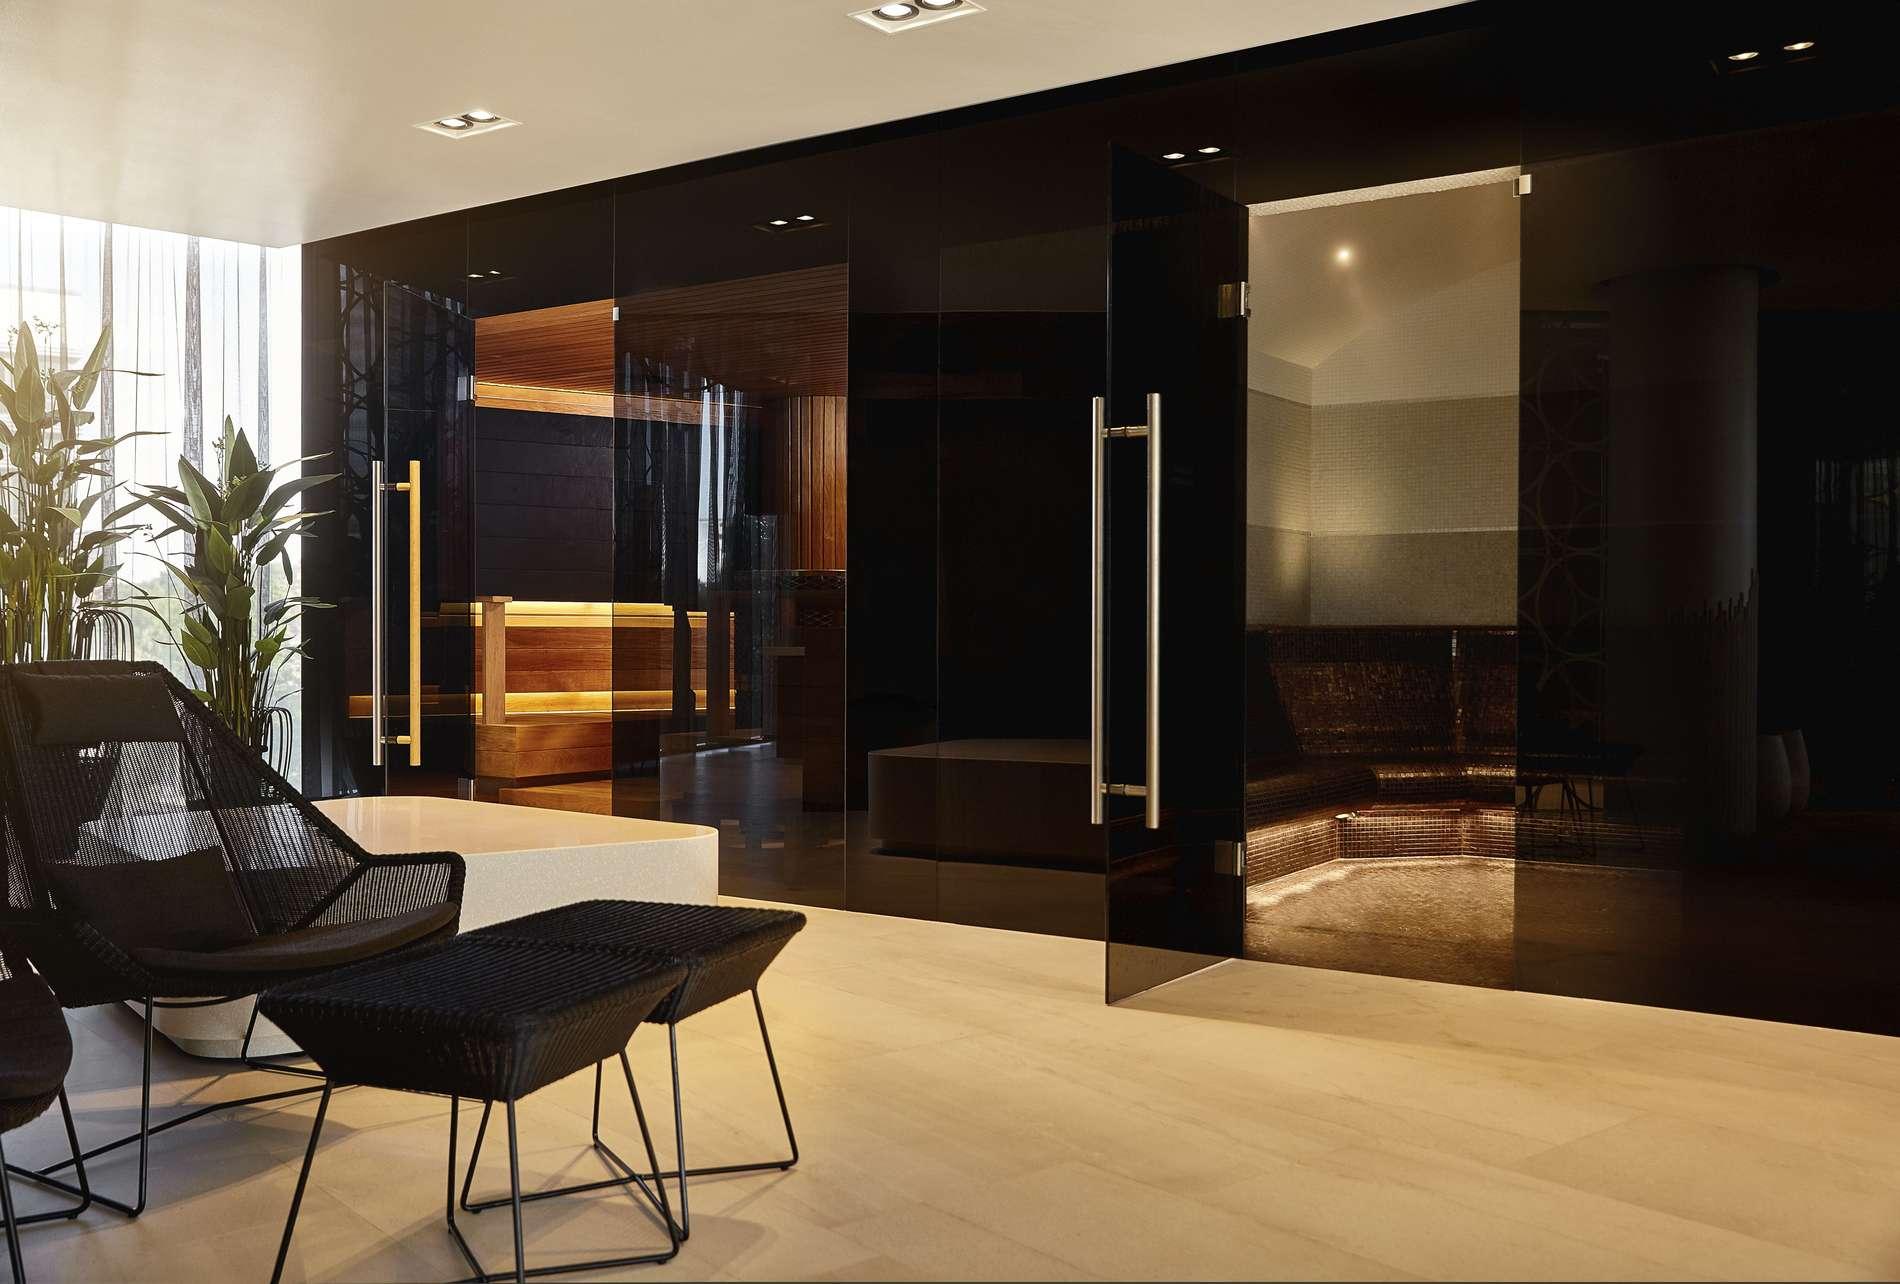 Hilton Eforea spa and health club Tallinnasa